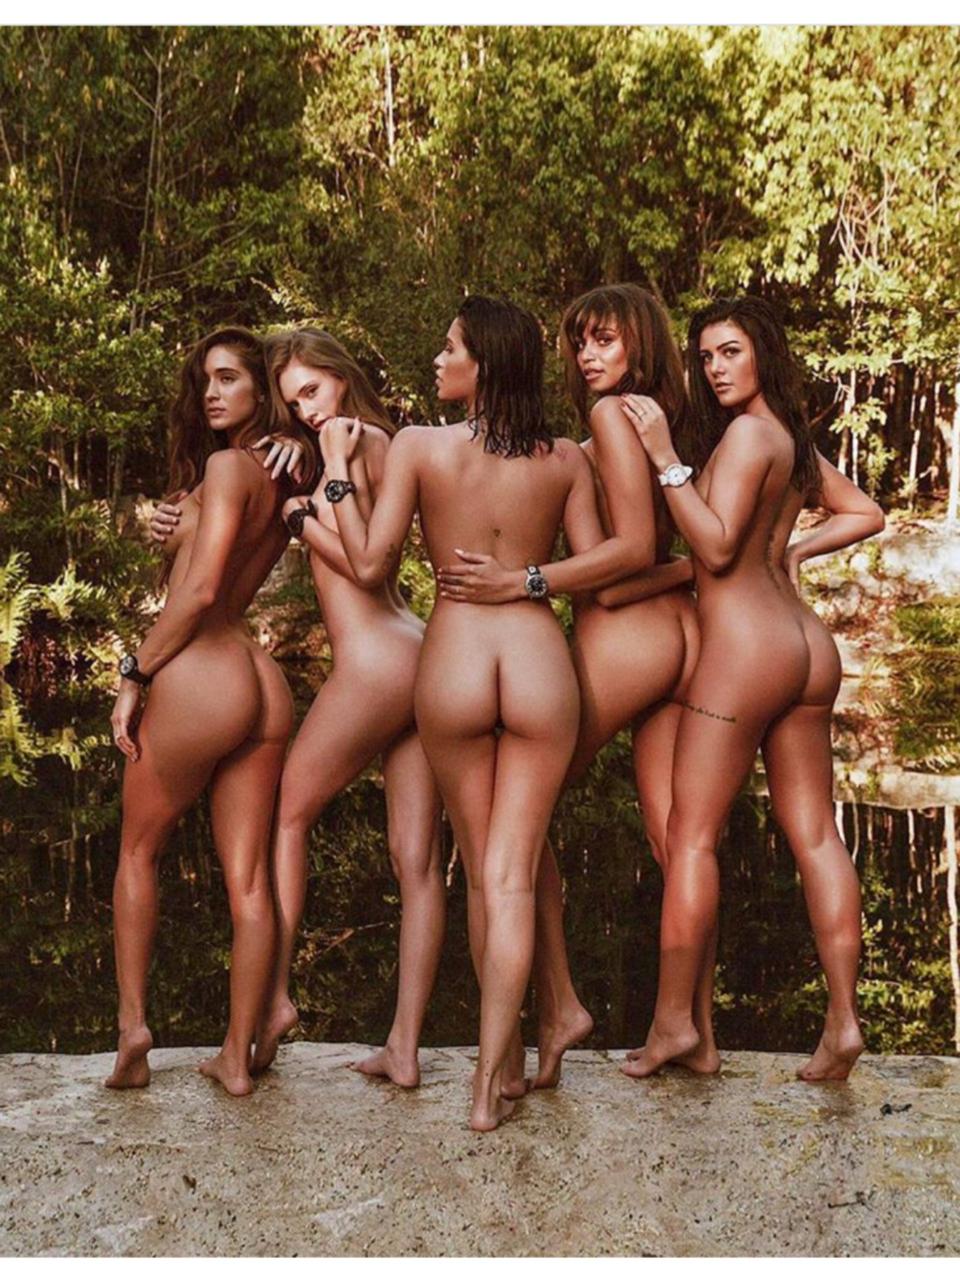 Tori Green Nude Photos Leaked!0052